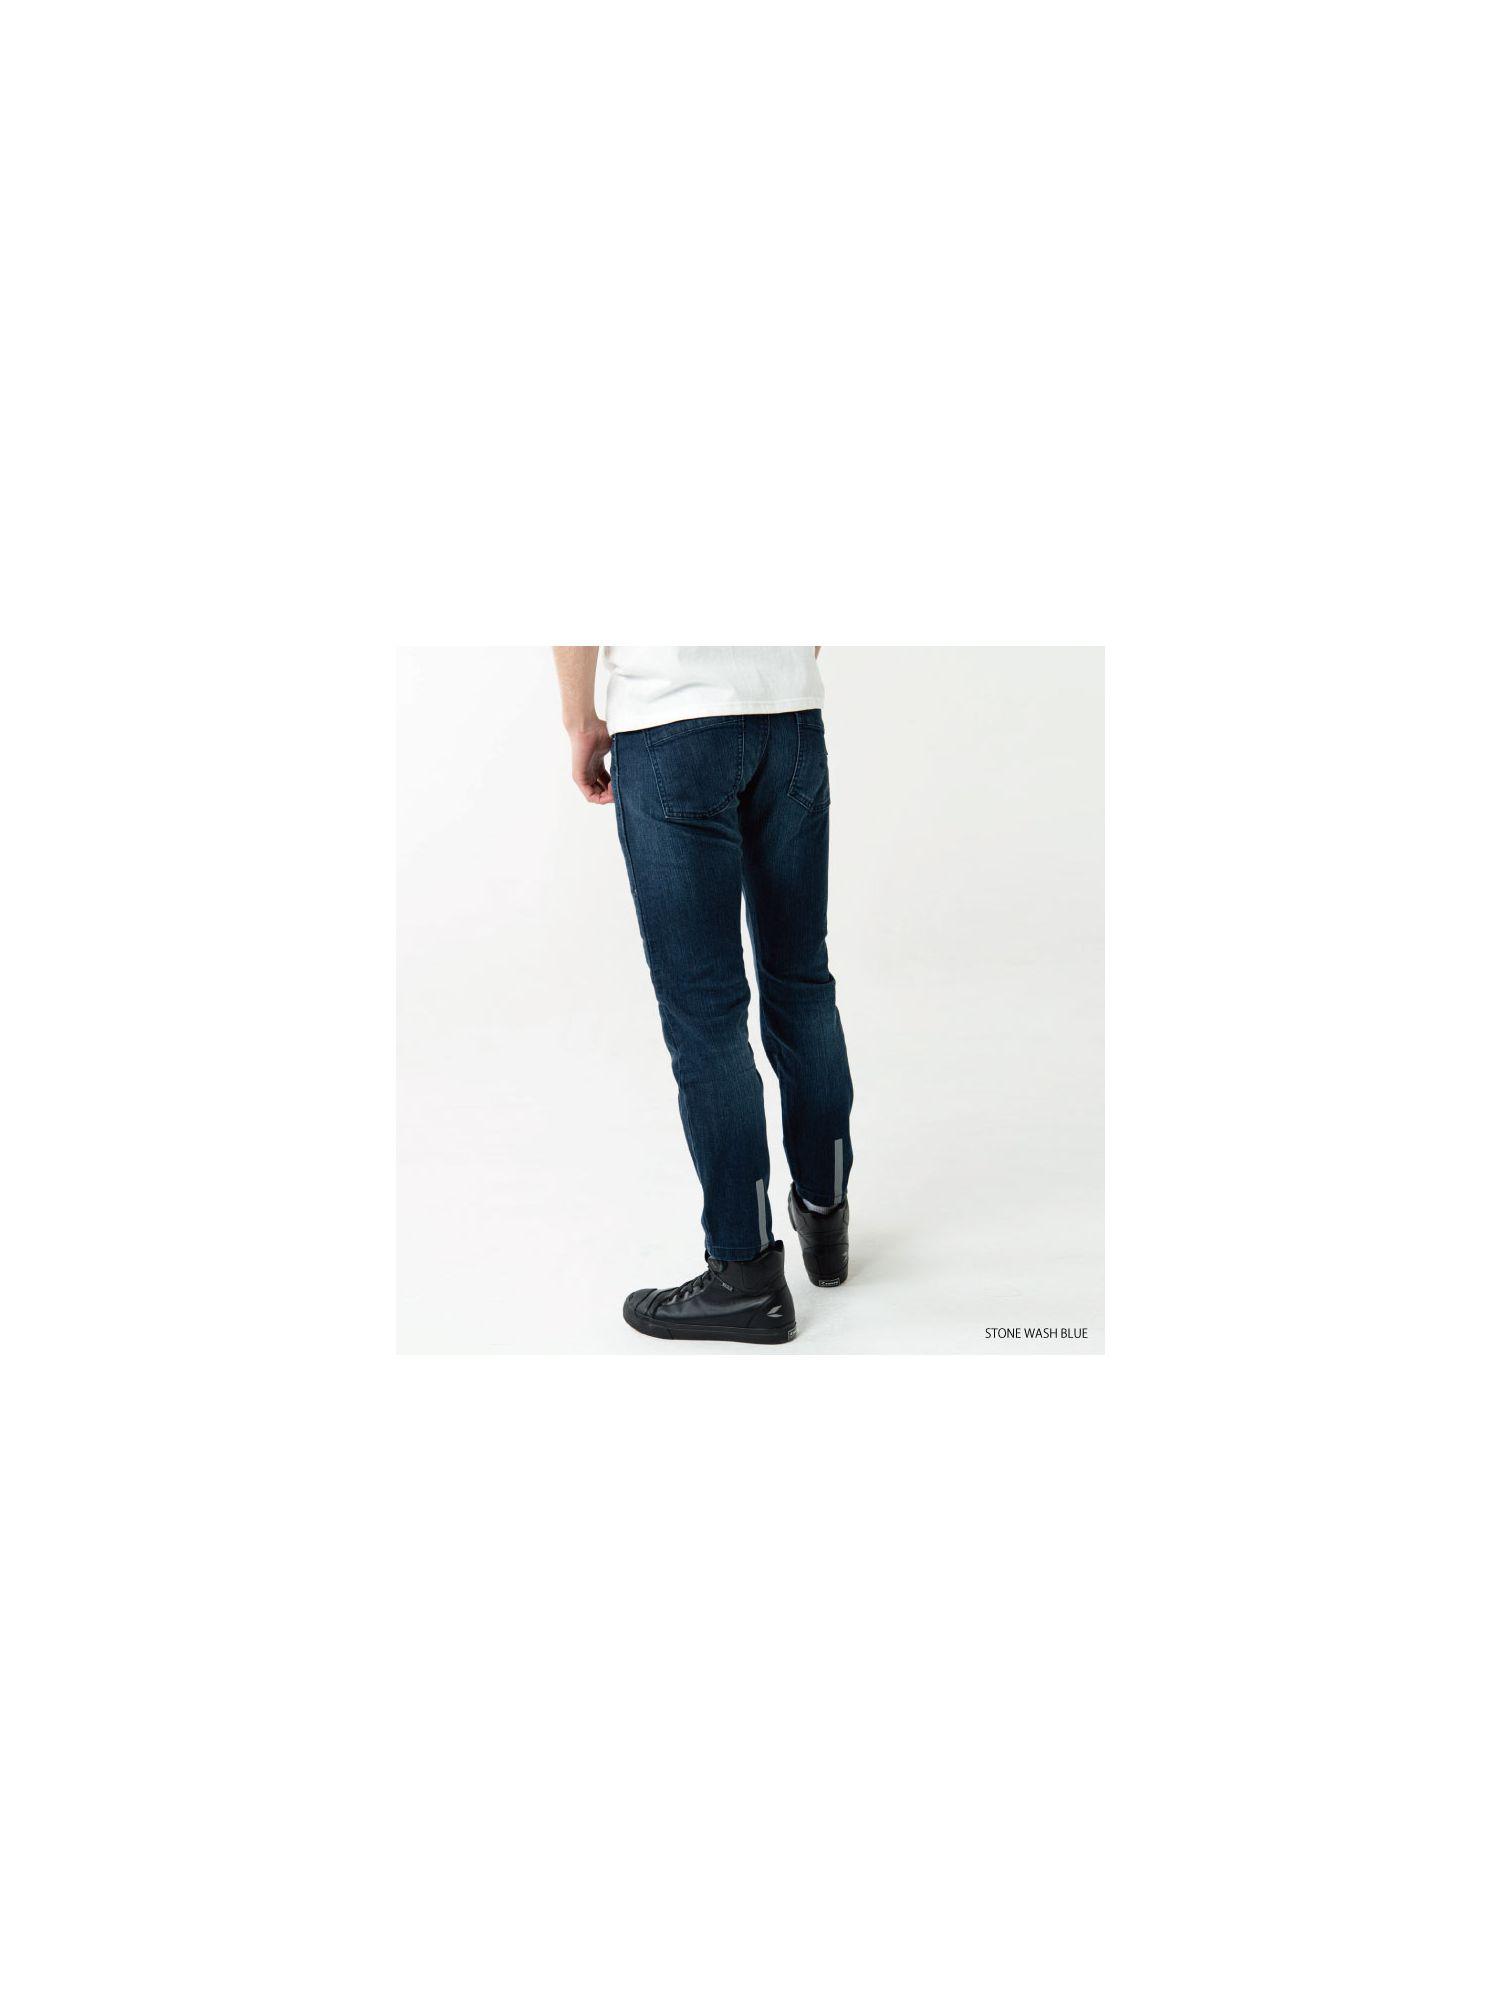 RSY260 | コーデュラ ストレッチ デニム(ショート)[2colors]